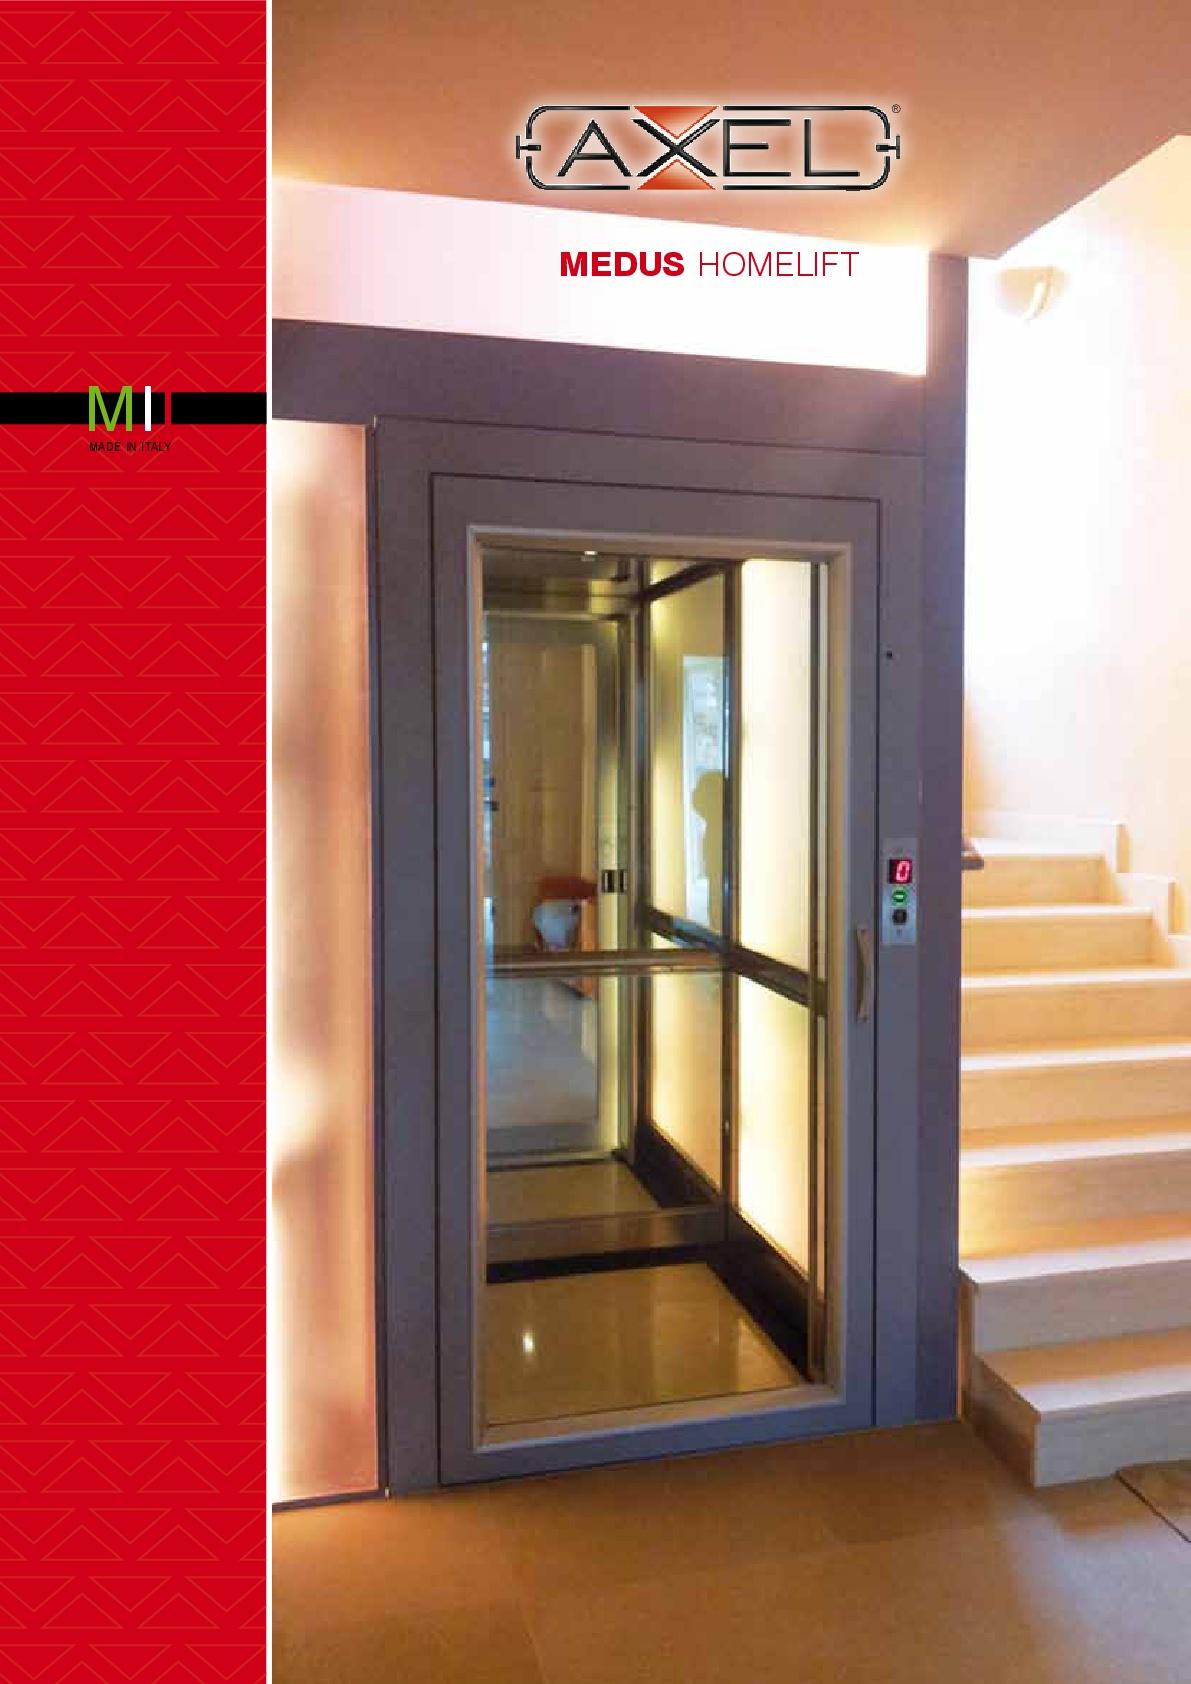 Axel-Medus-Homelift-Brochure-001